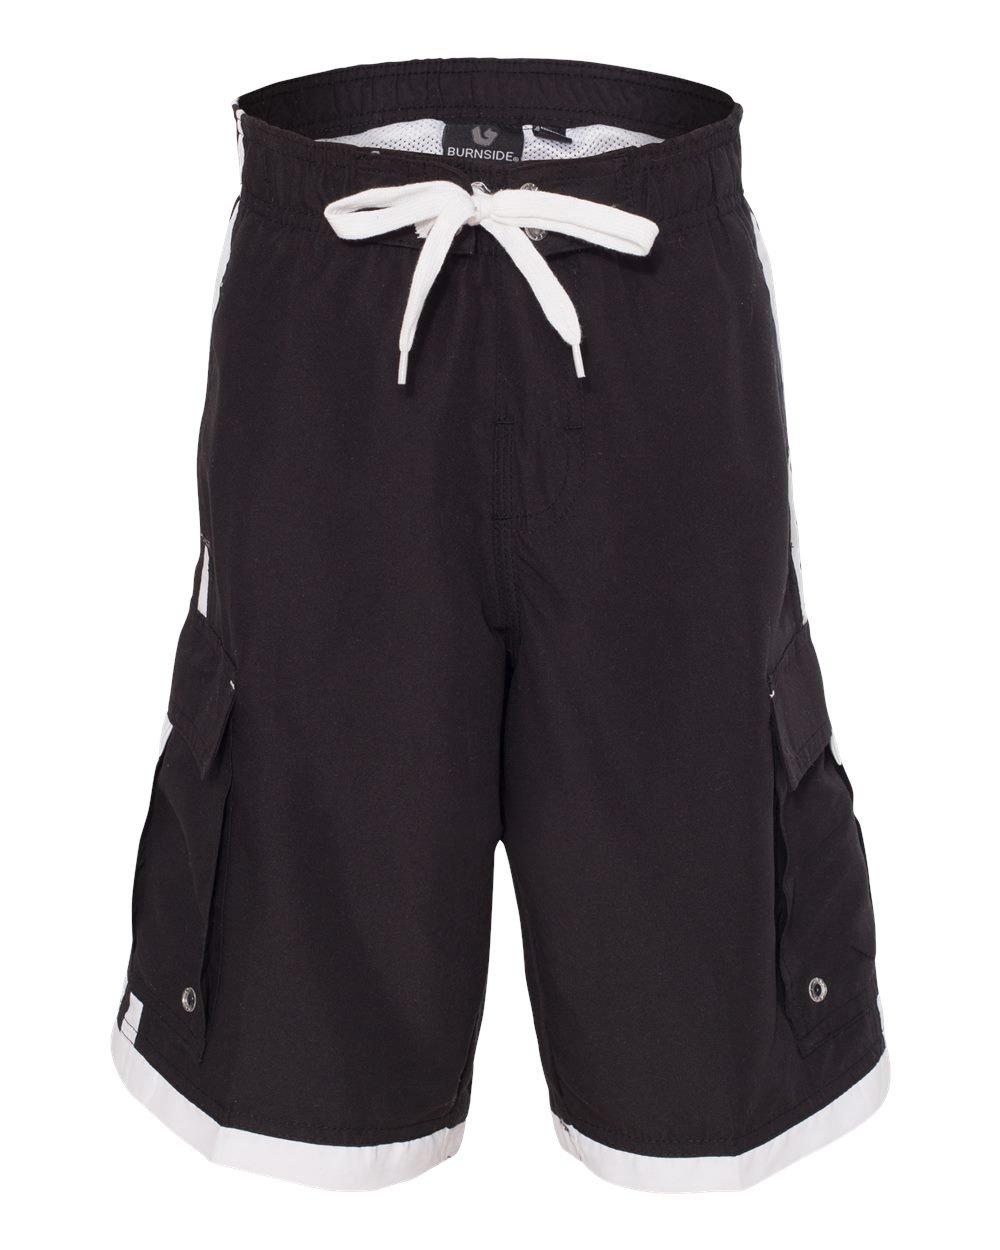 Burnside Boy's 4401 Youth Striped Board Shorts Swim Trunks (Small, Black/White)